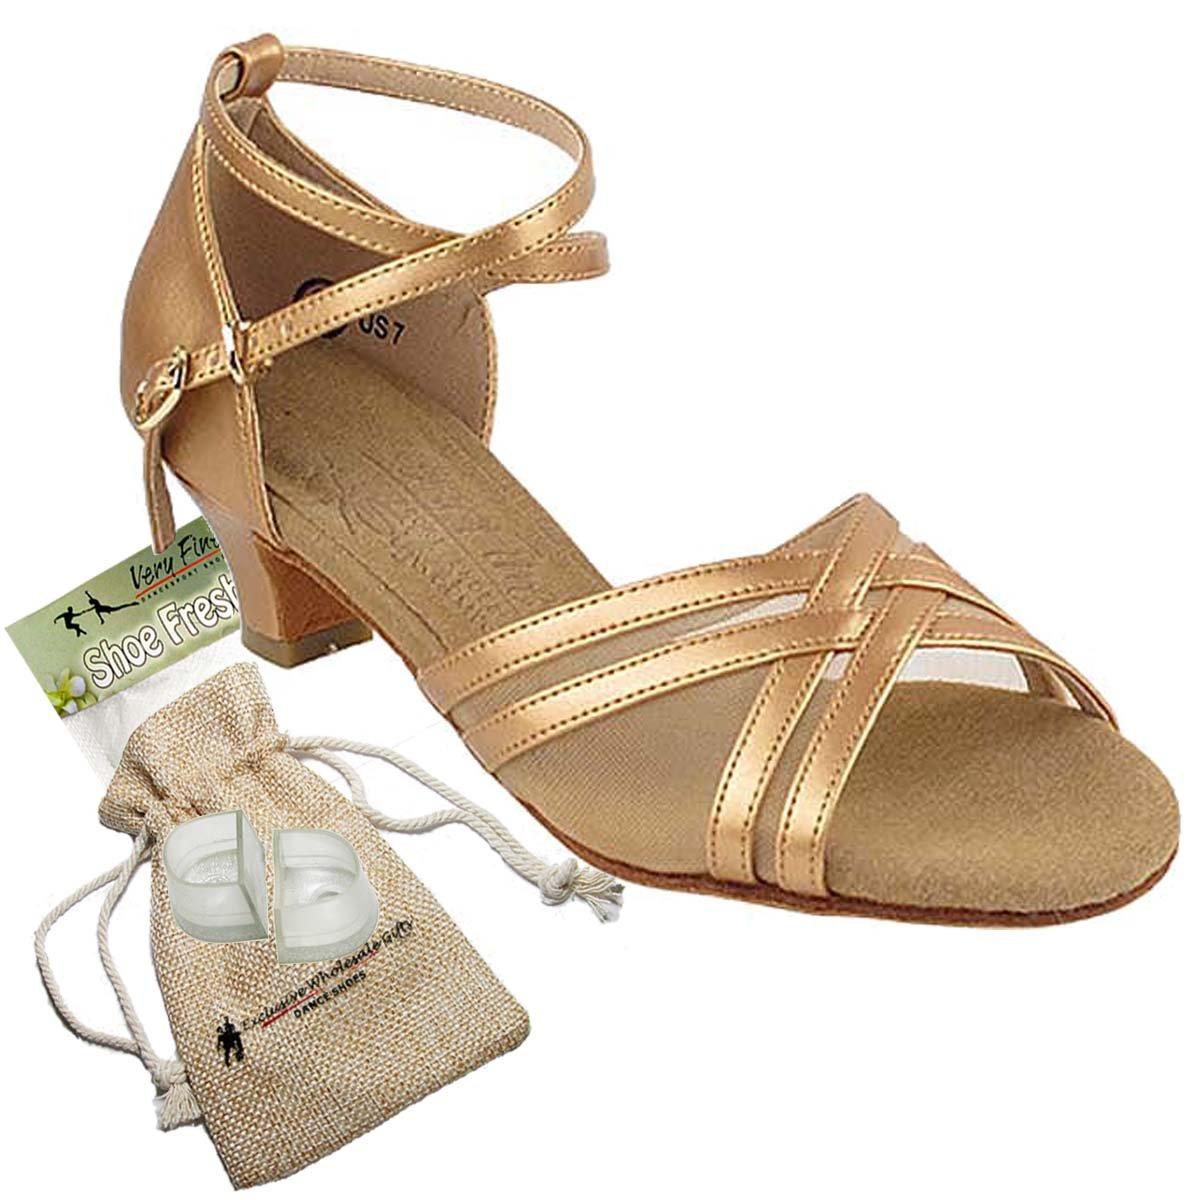 Women's Ballroom Dance Shoes Salsa Latin Practice Dance Shoes Copper Nude Leather S9204EB Comfortable - Very Fine 1.2'' Heel 9 M US [Bundle of 5]